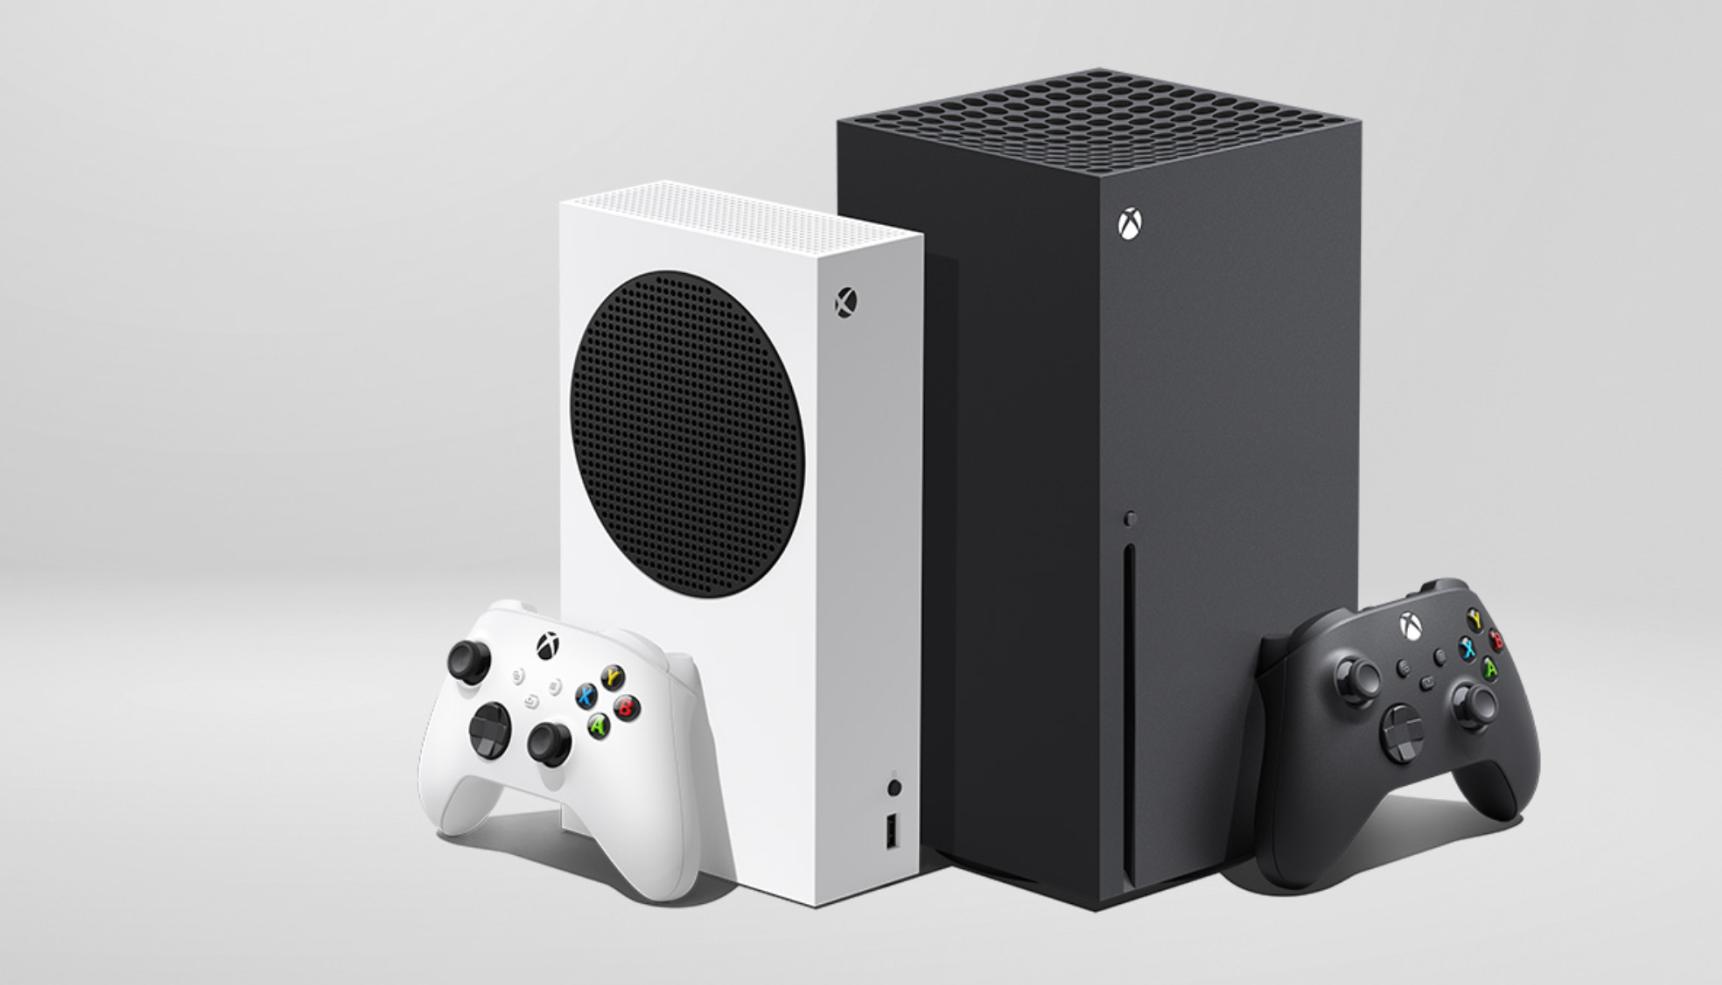 微软Xbox Series S体验:入门游戏主机